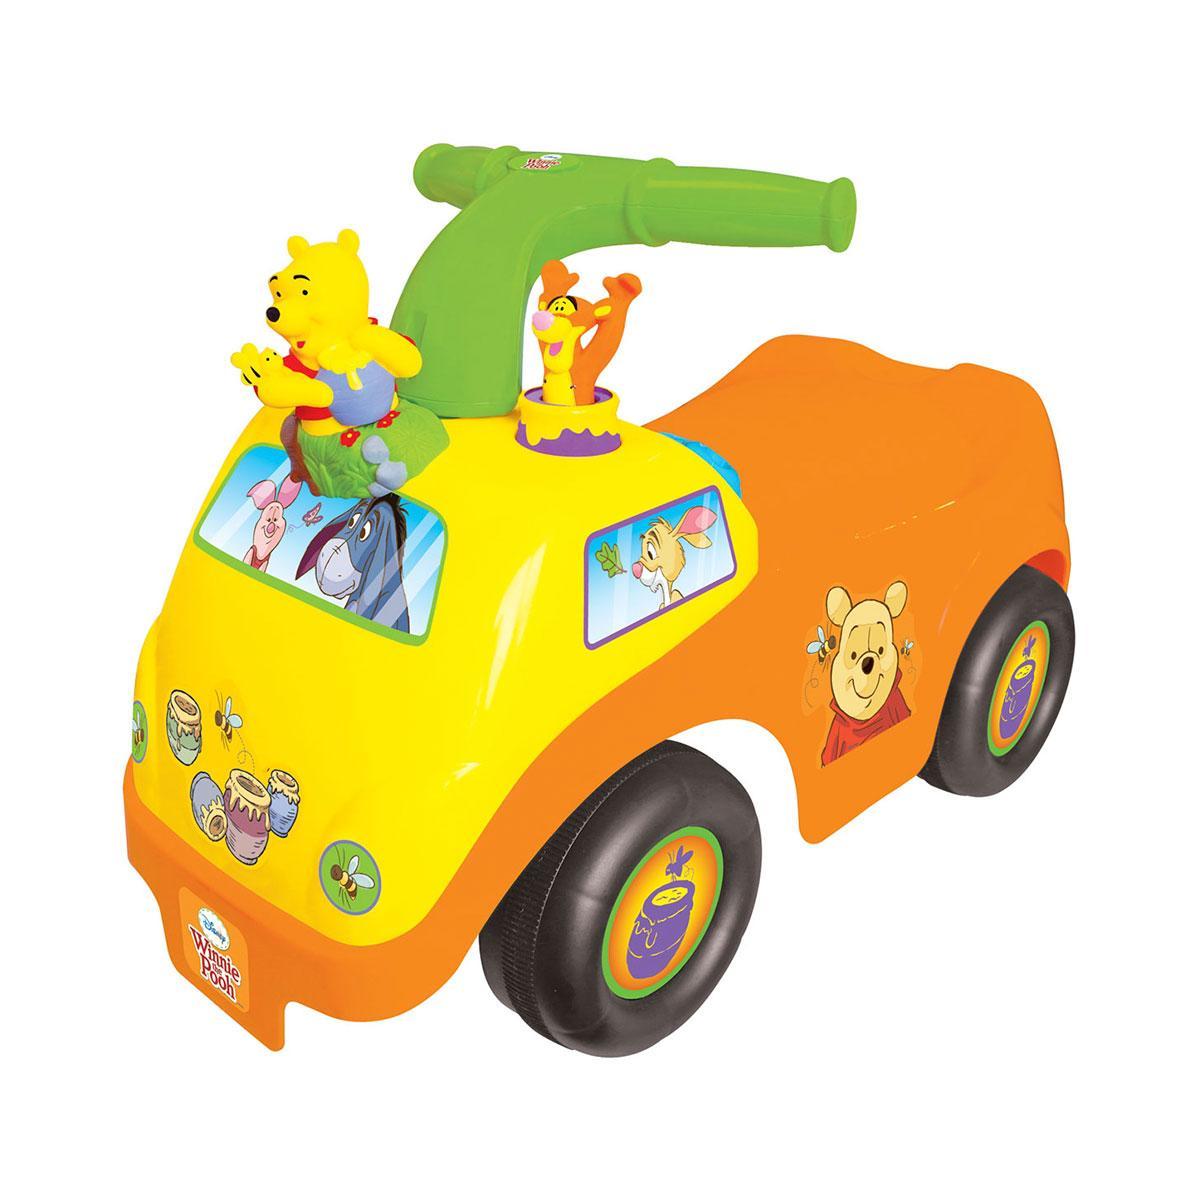 Машинка каталка Чудомобиль-мини - Винни-Пух Kiddieland Winnie-the-Pooh Activity Ride On 050435